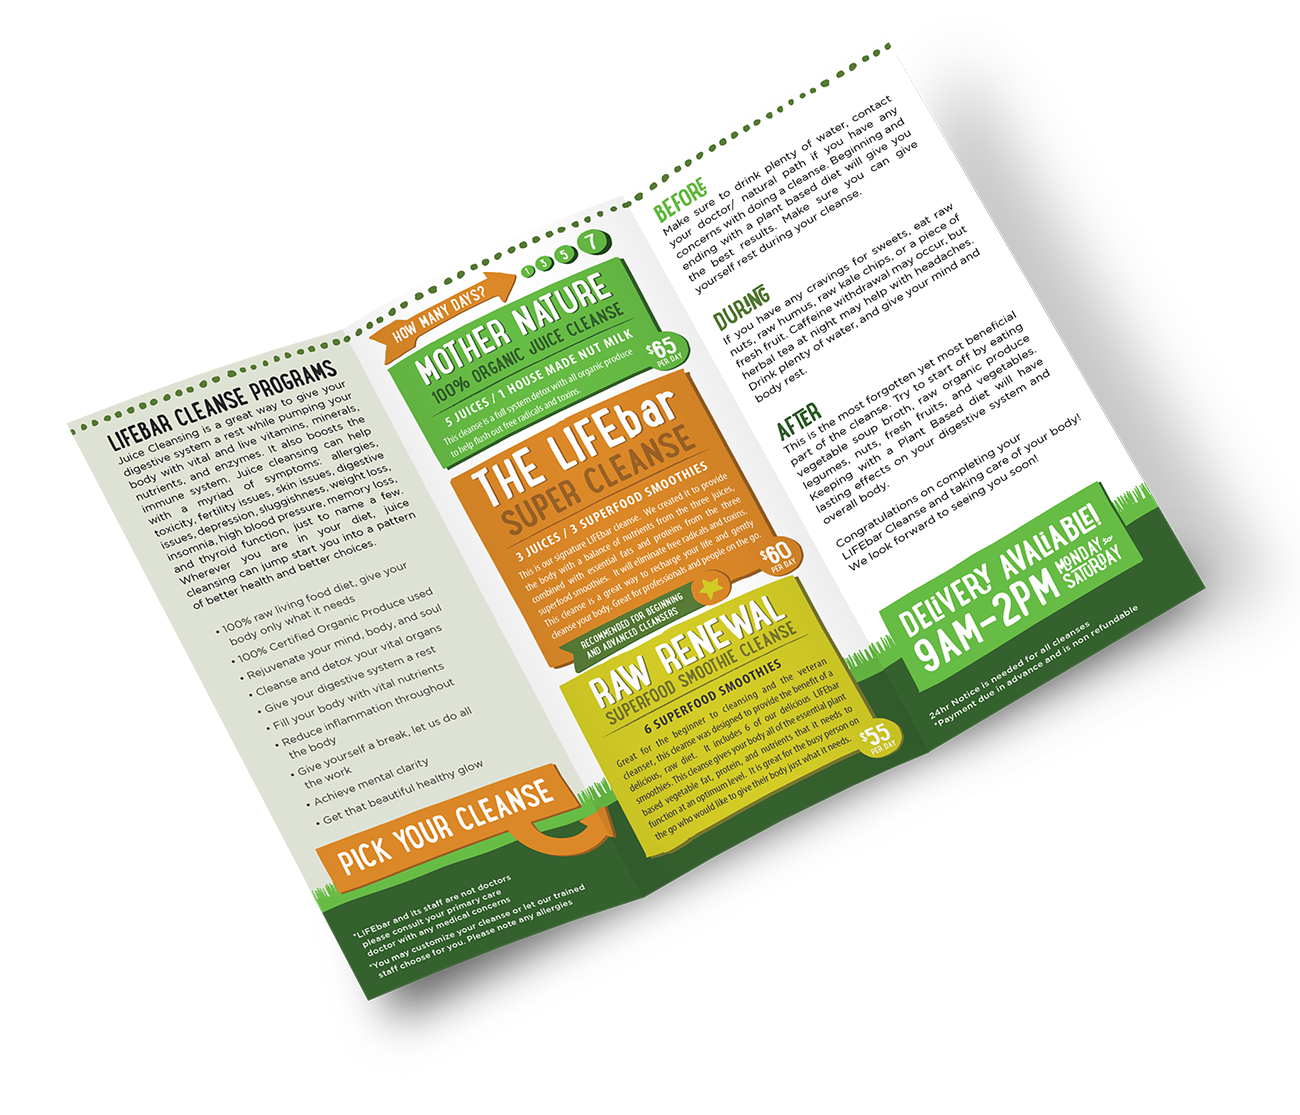 LIFEbar Cleanse Brochure